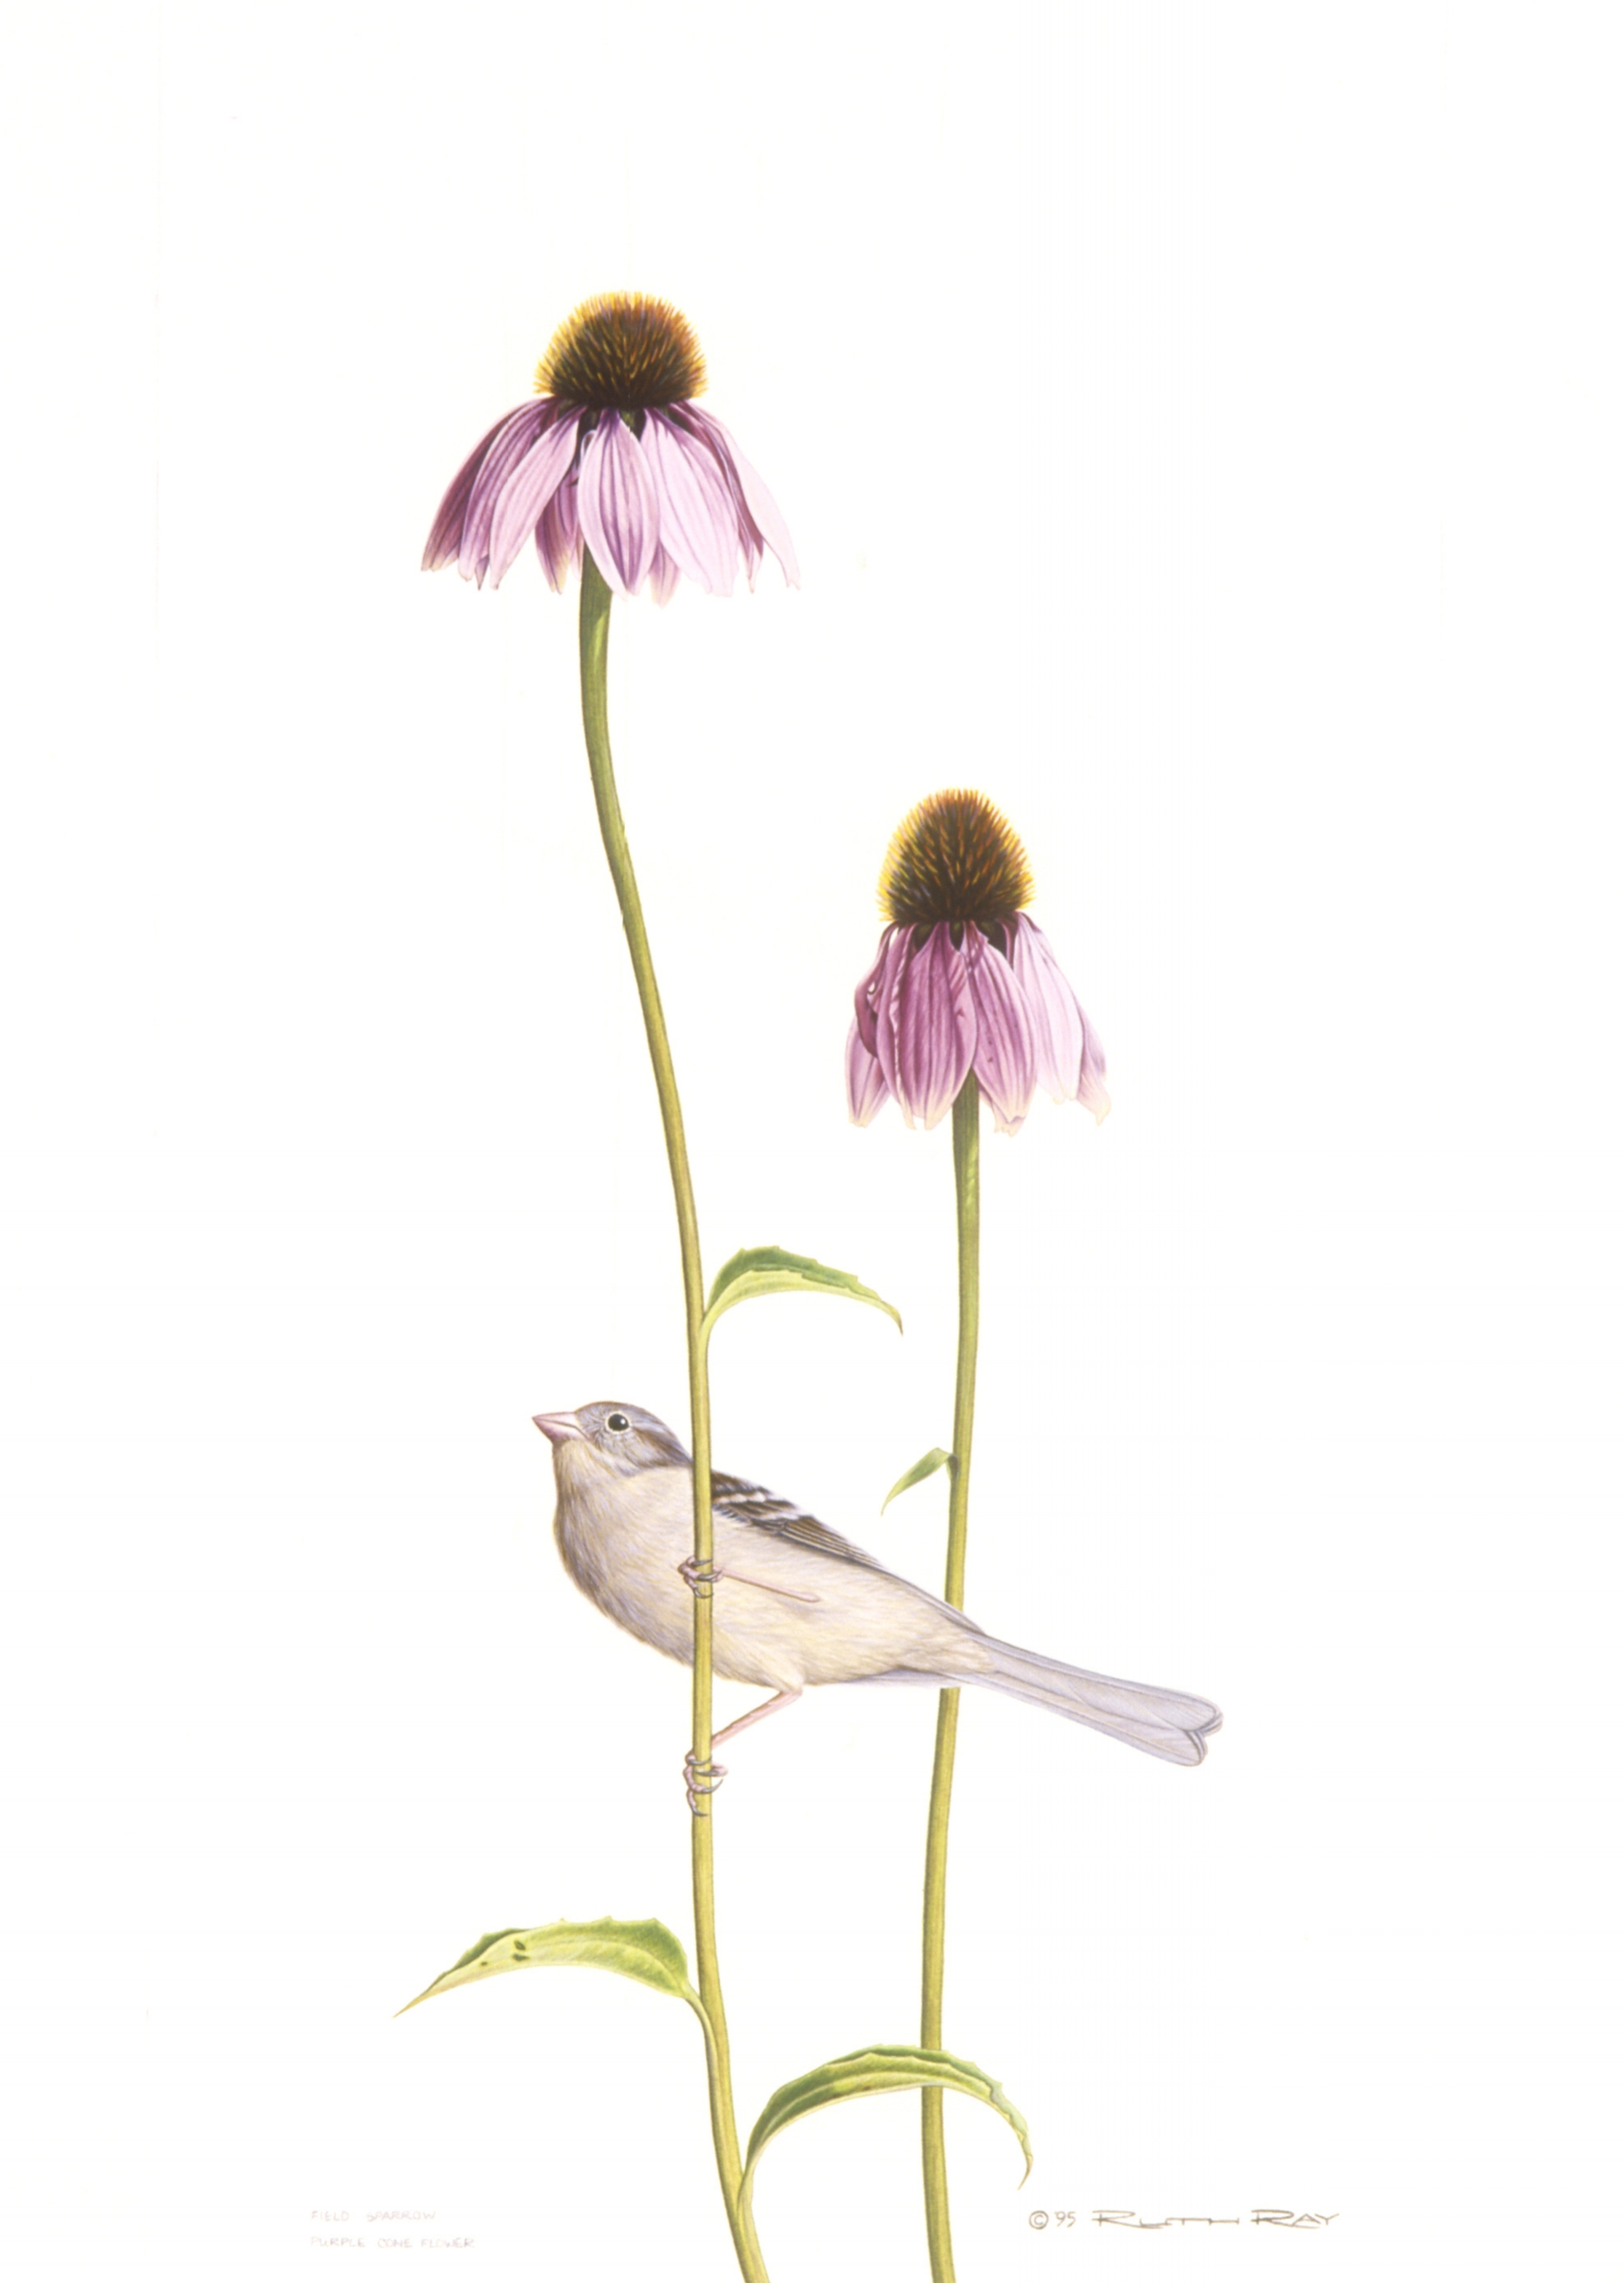 Field Sparrow/Purple Cornflower - 8